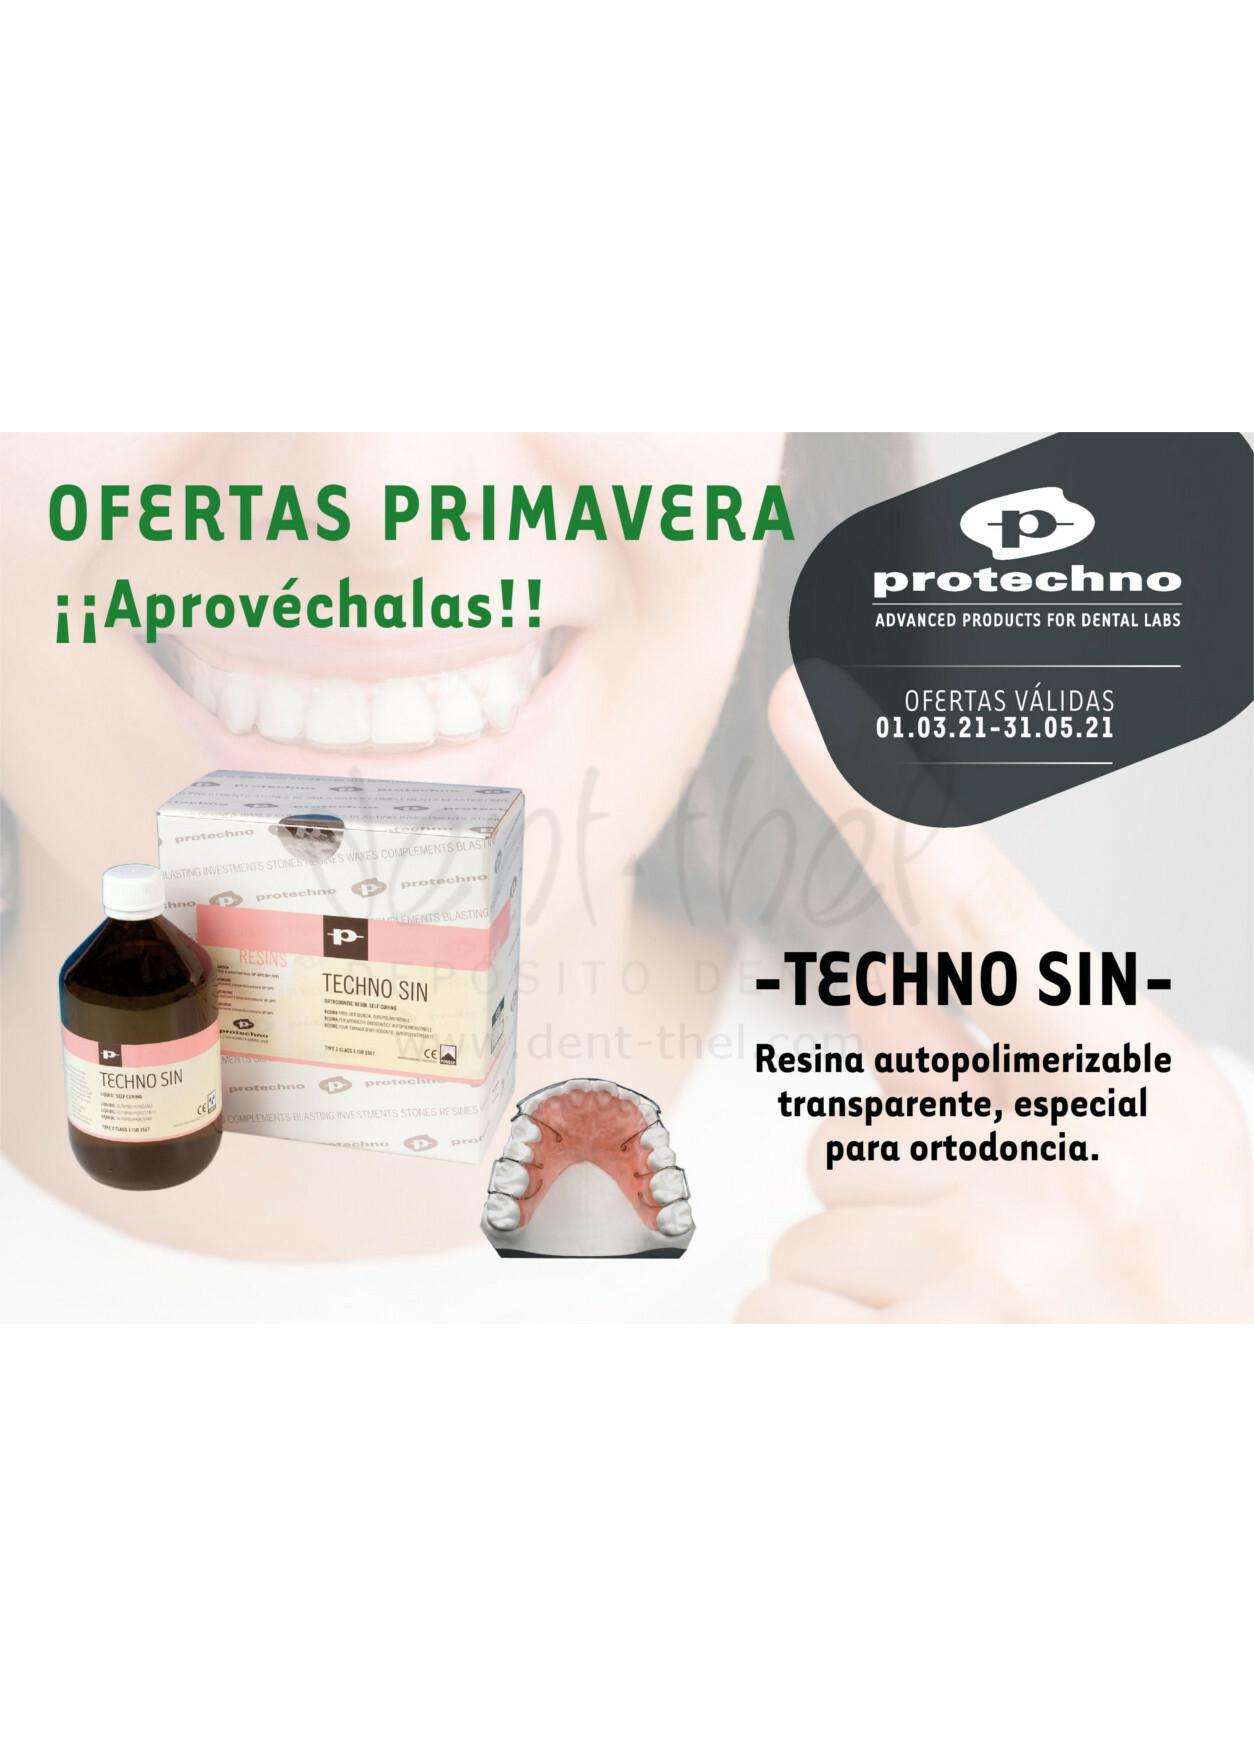 Ofertas Protechno hasta 31/05/2021